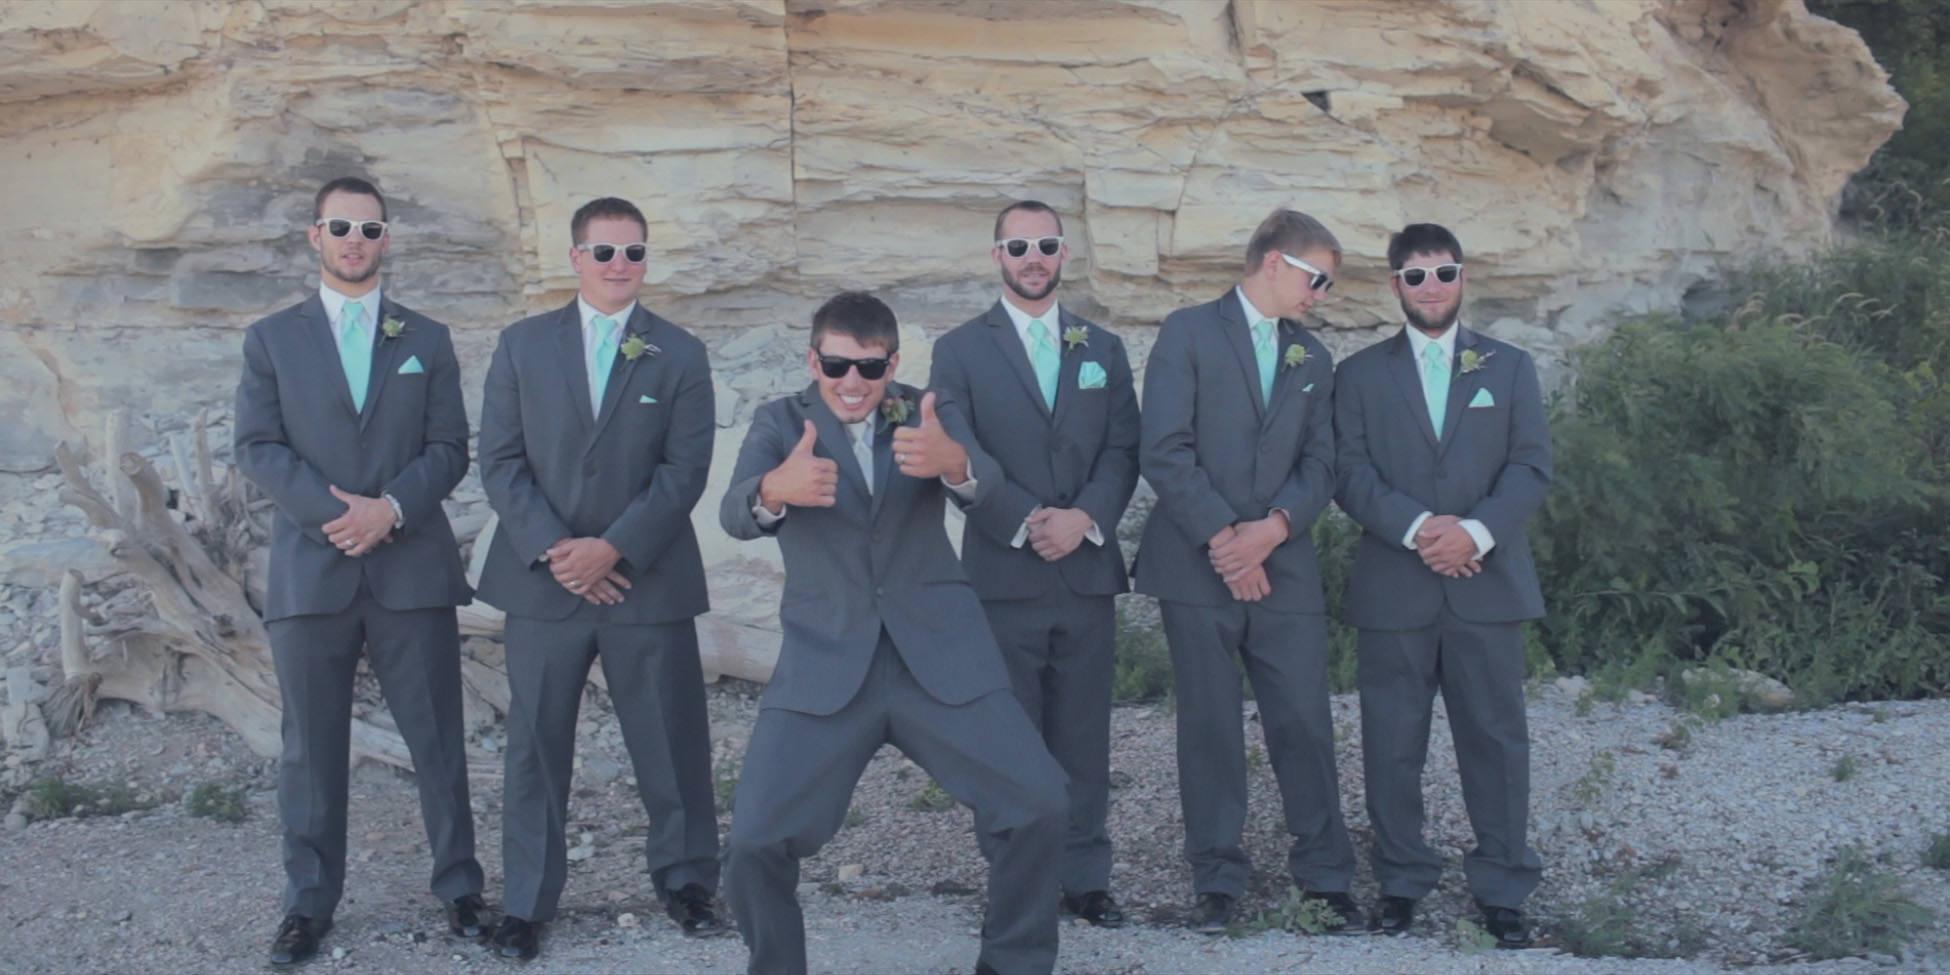 wedding groomsman glasses pose